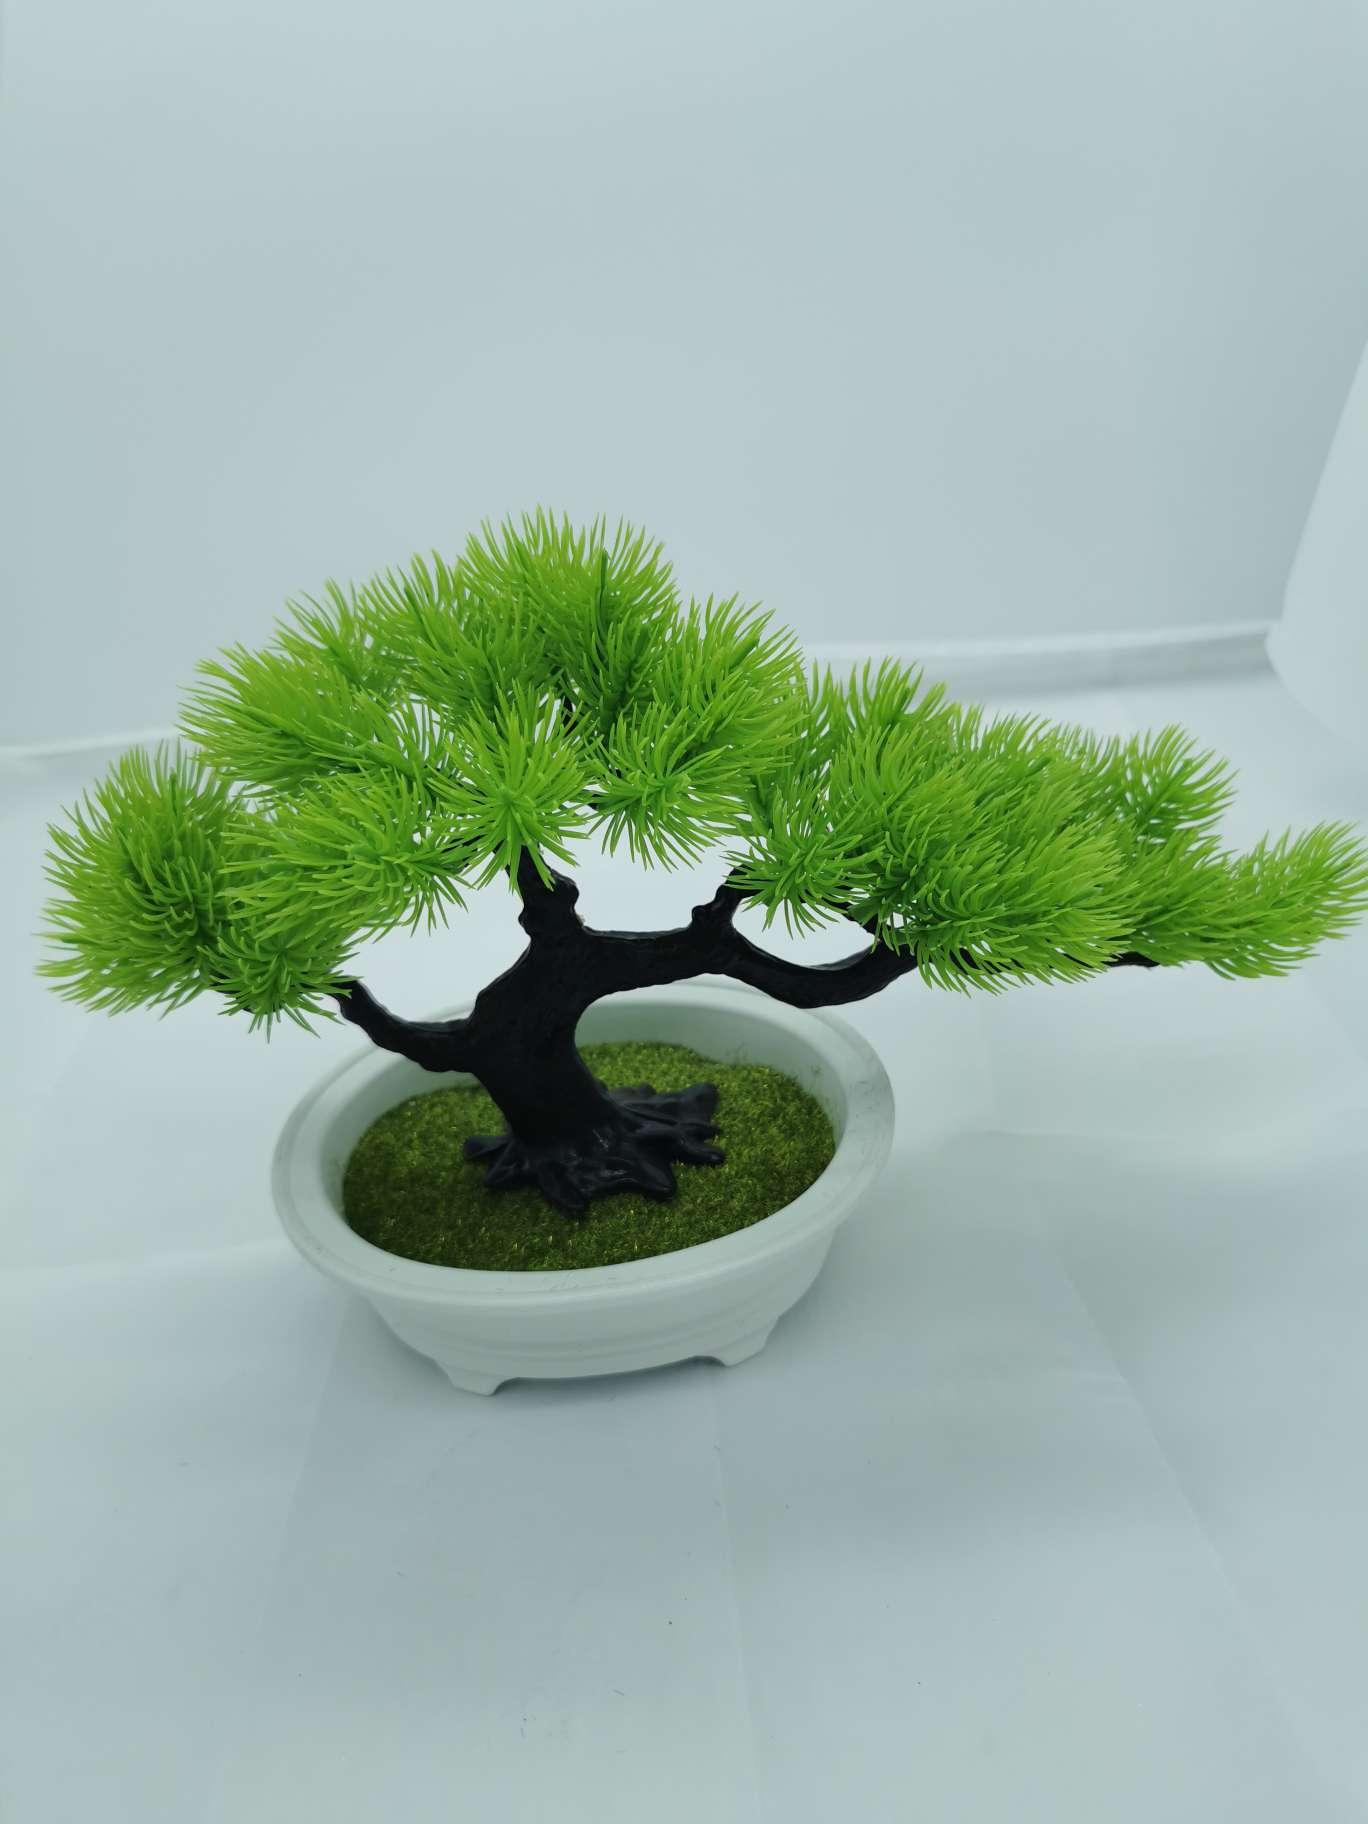 ad006盆景办公仿真植物家居工艺品室内装饰人造植物盆栽